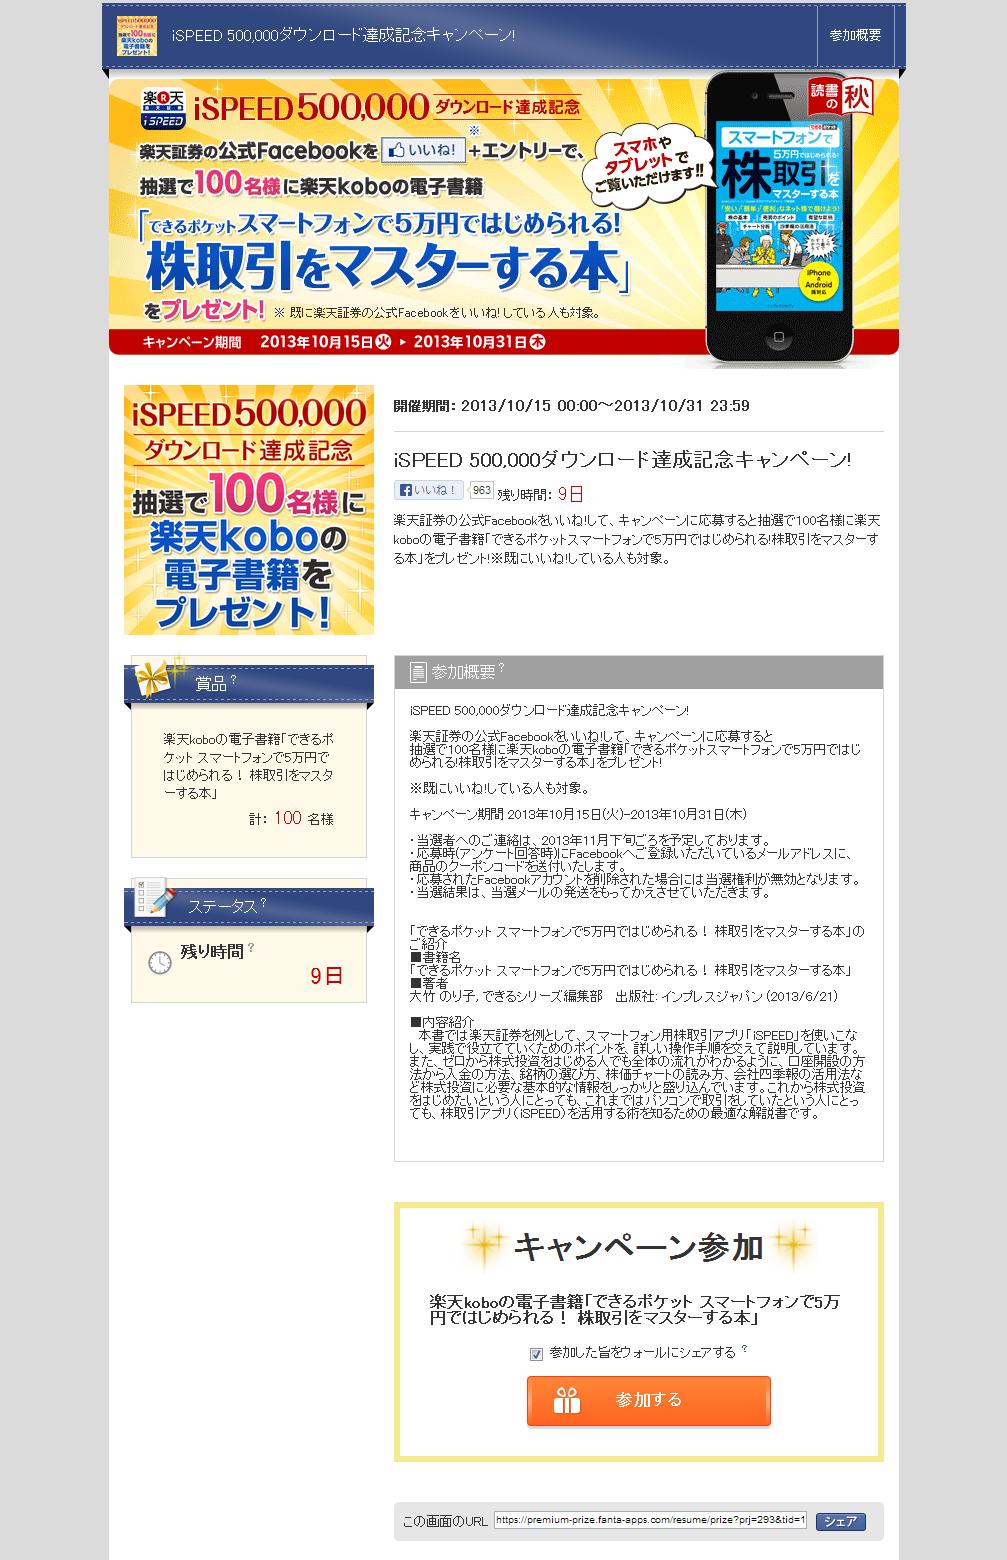 Fantastics「アンケート型」懸賞アプリ(楽天証券株式会社様)